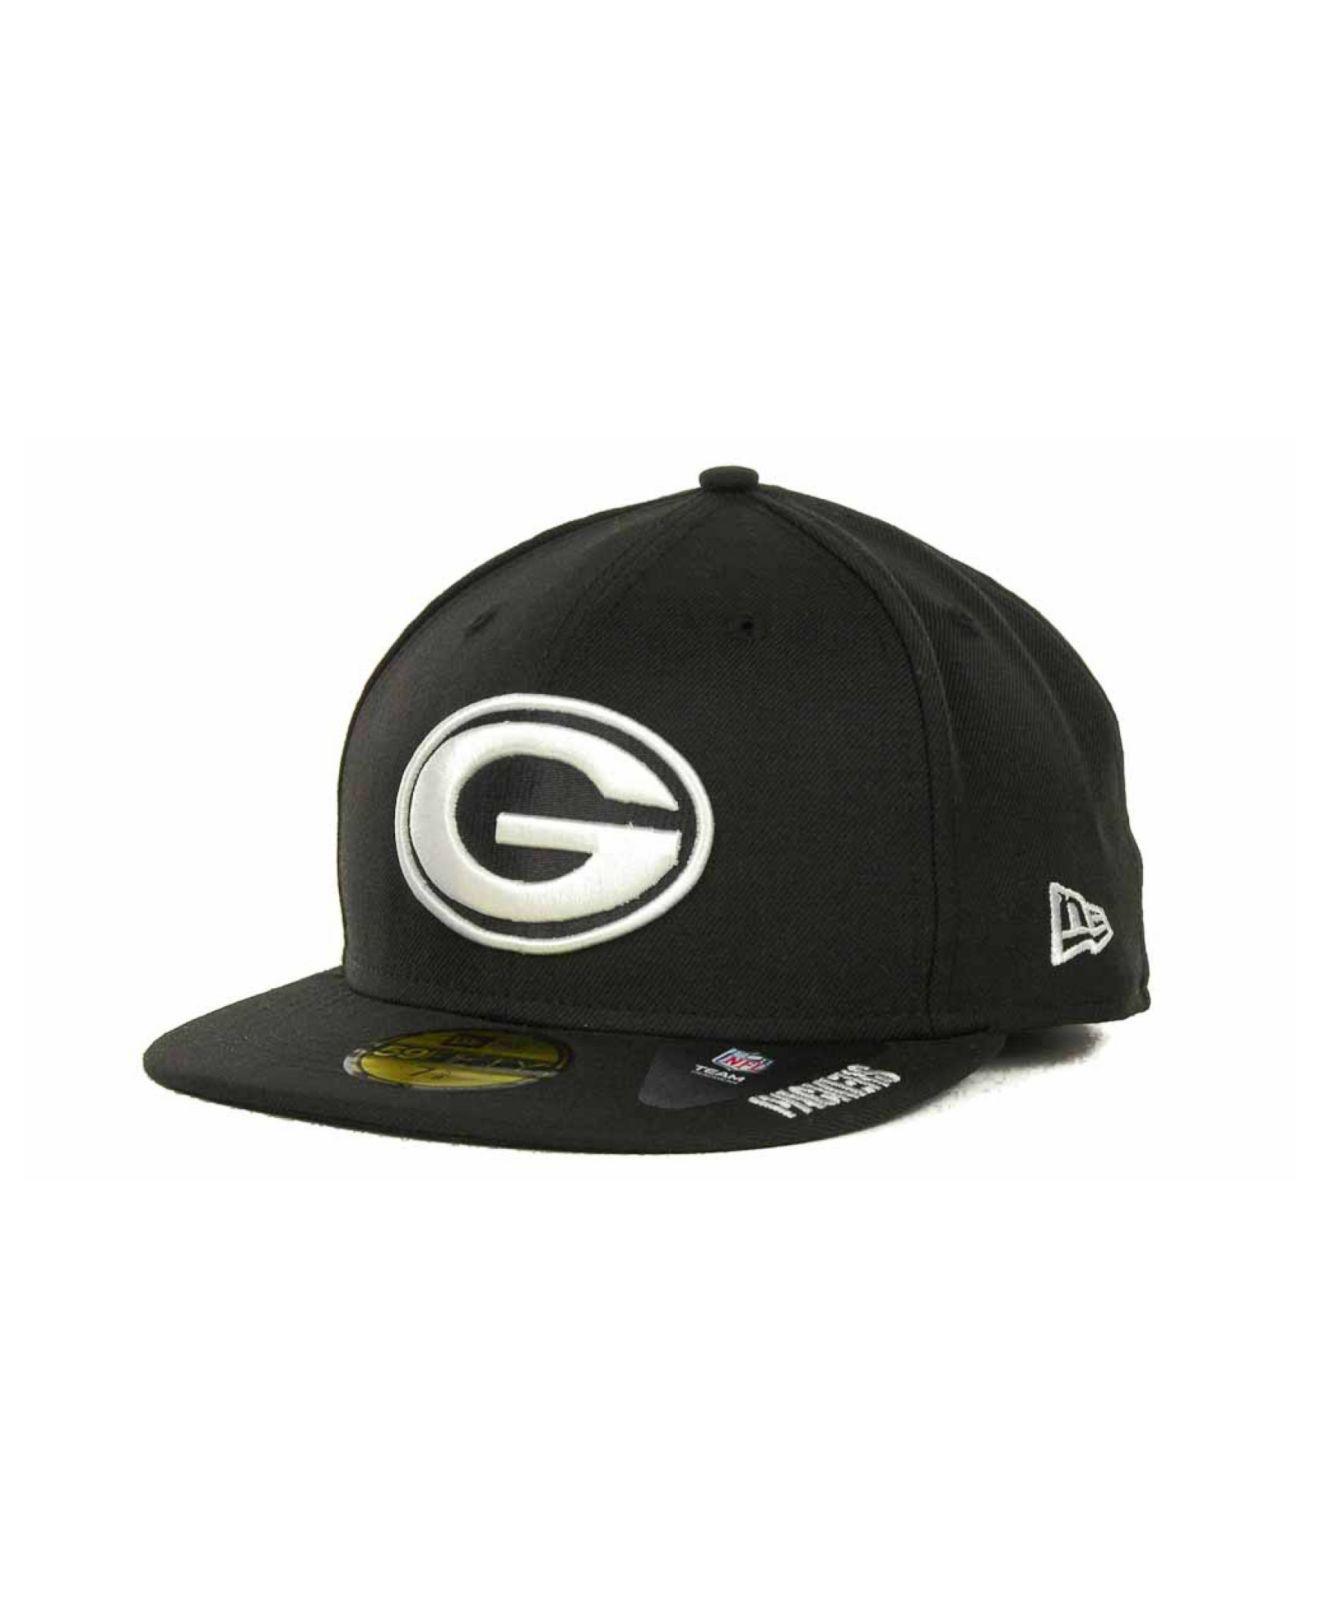 d22f51335 Lyst - Ktz Green Bay Packers 59fifty Cap in Black for Men